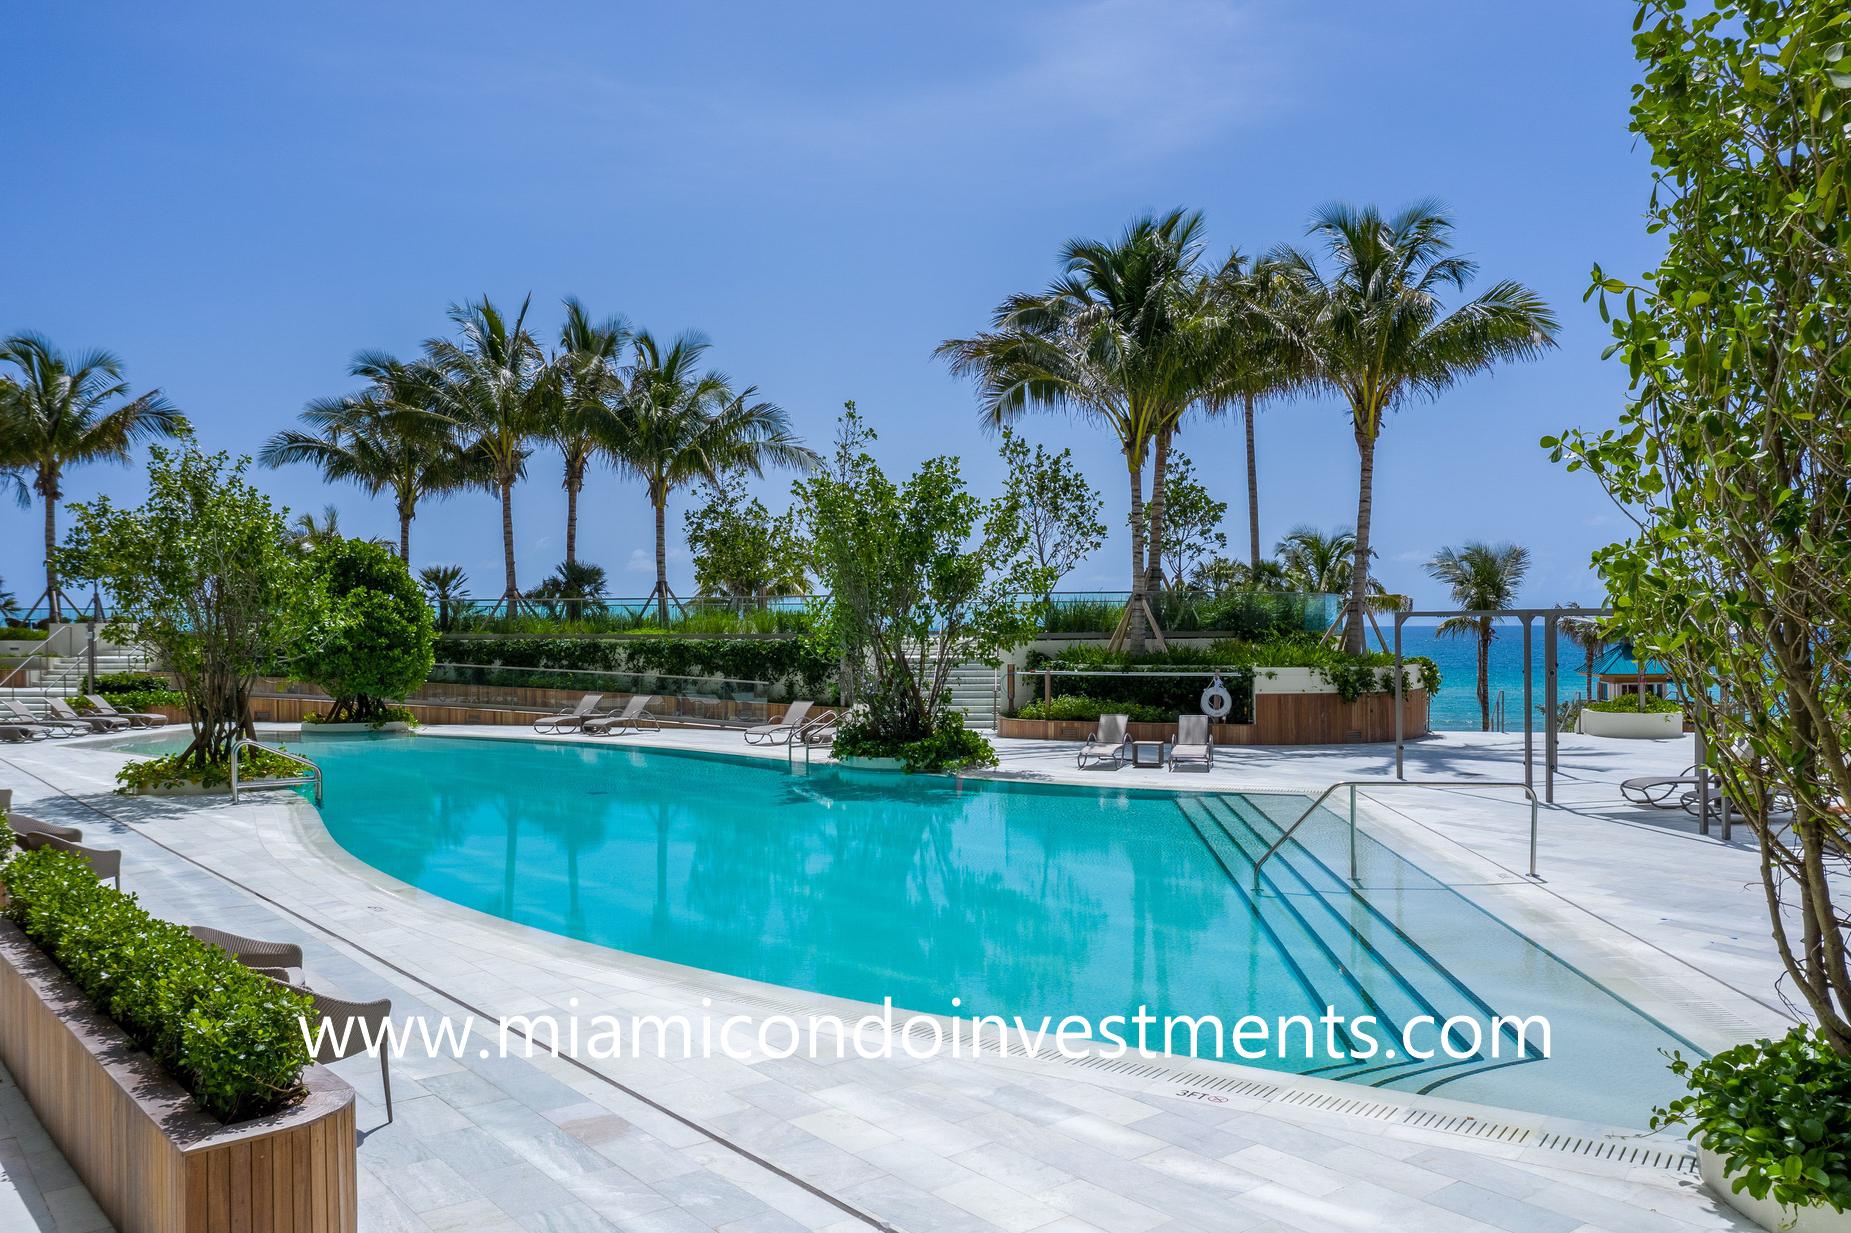 infinity-edge pool at Armani Casa Residences